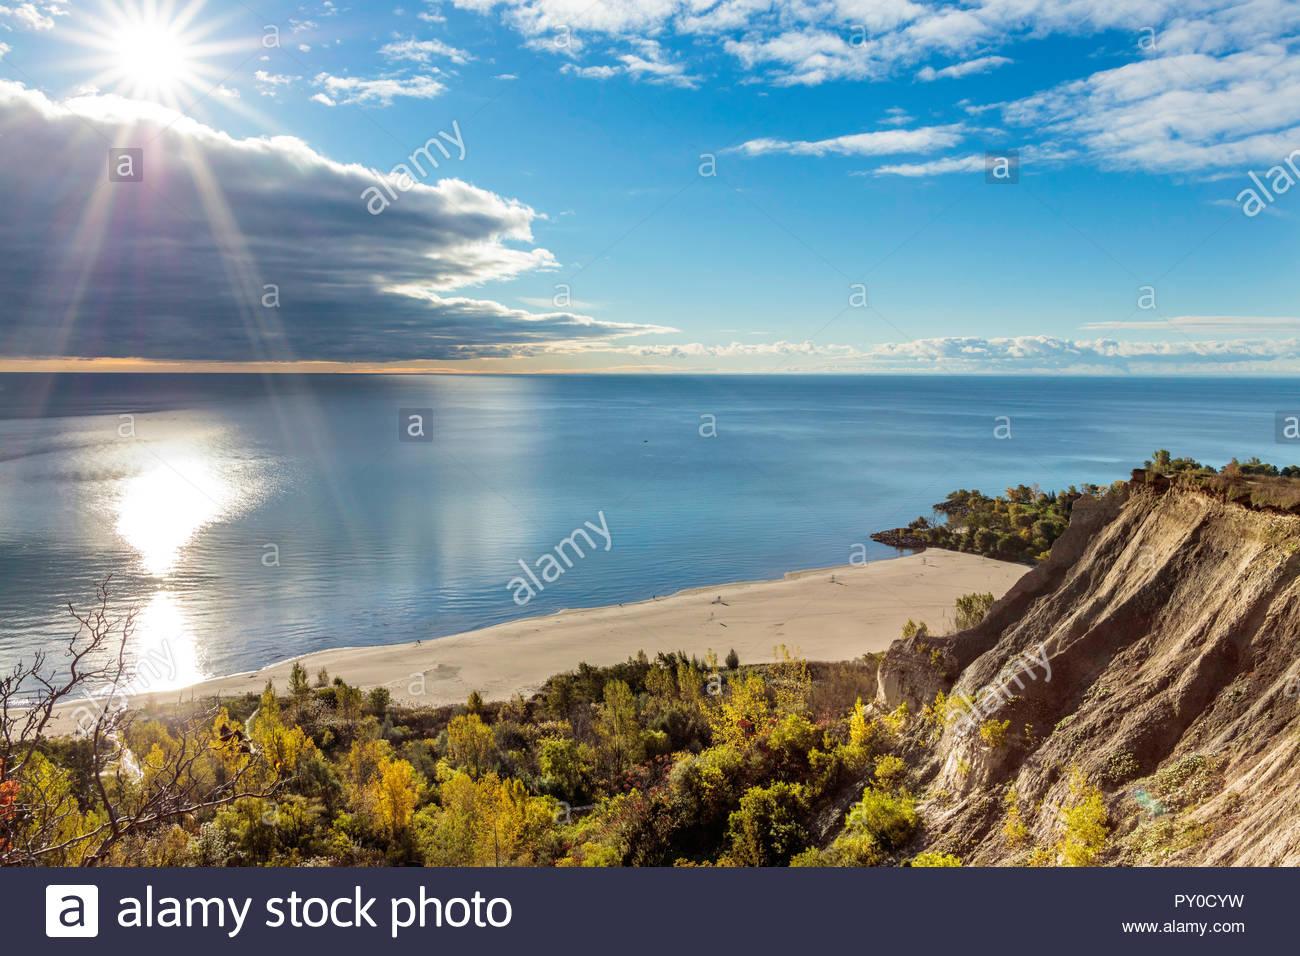 Sandstone cliff of the Scarborough Bluffs an escarpment beside Lake Ontario in Toronto Ontario Canada Stock Photo